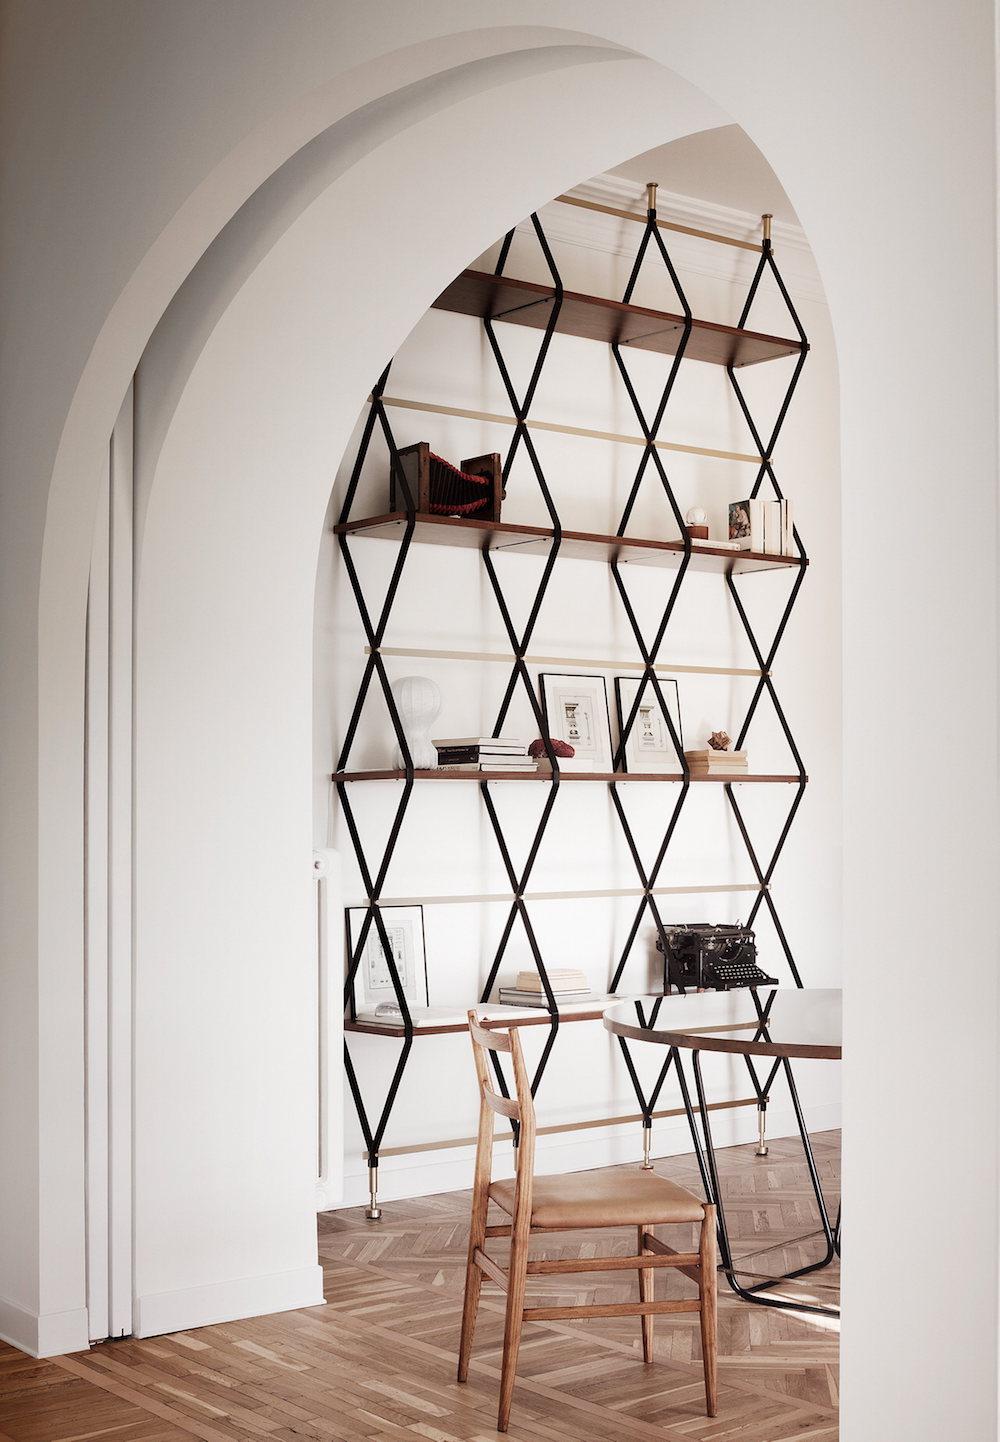 6-quincoces-drago-and-partners-apartment-roma-interior-design-2014-home-sunday-sanctuary-oracle-fox-0